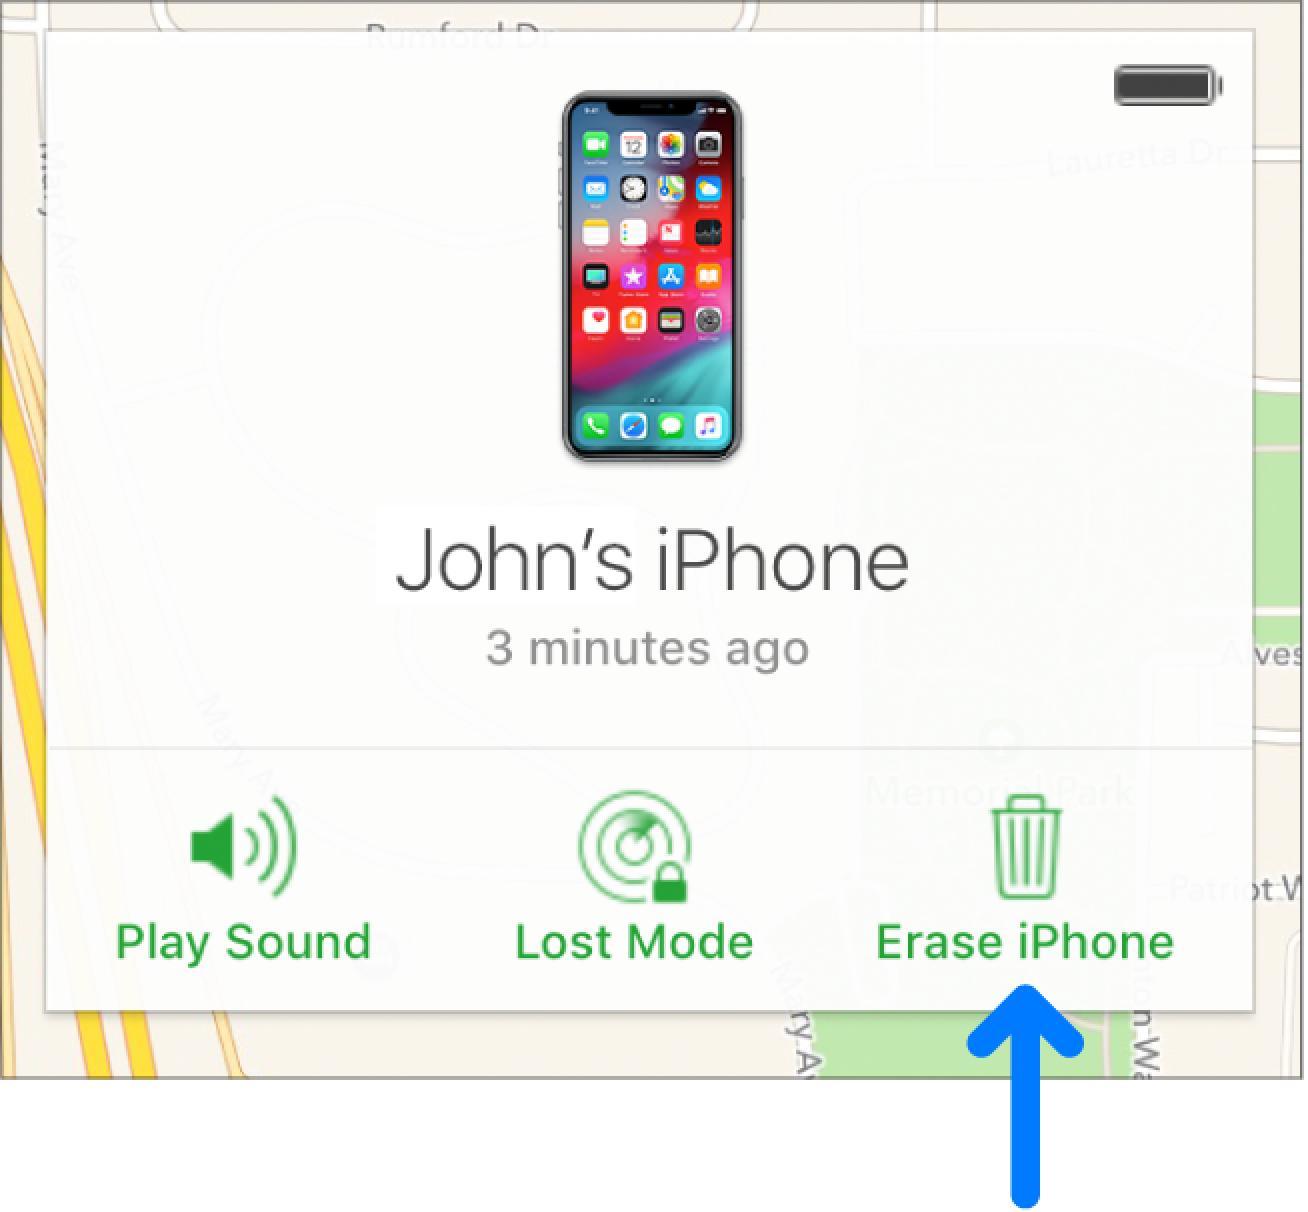 remotely-erase-iPad-on-iCloud-02